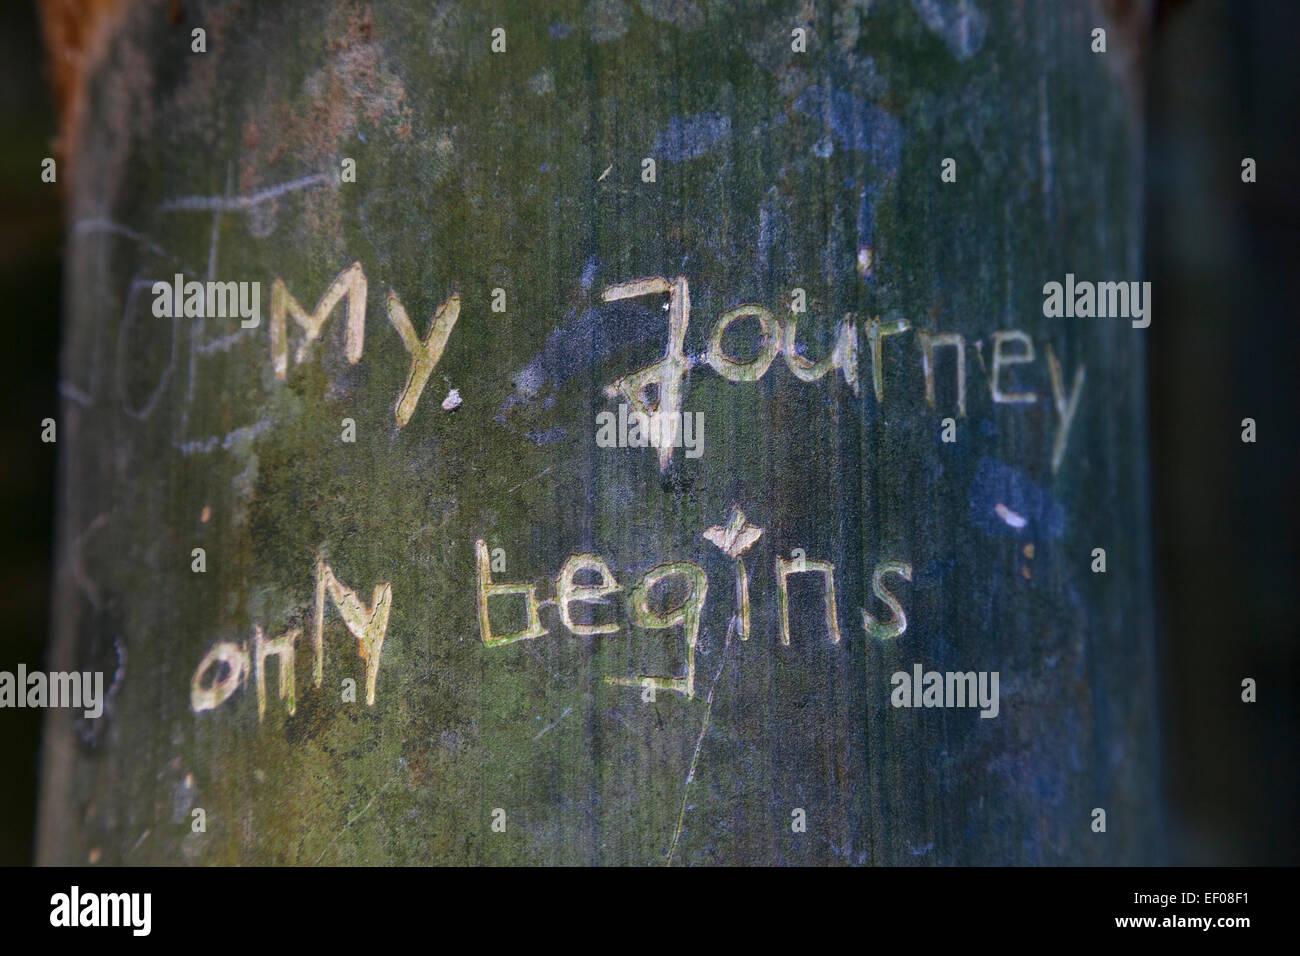 My journey only begins, written in a tree, Australia - Stock Image